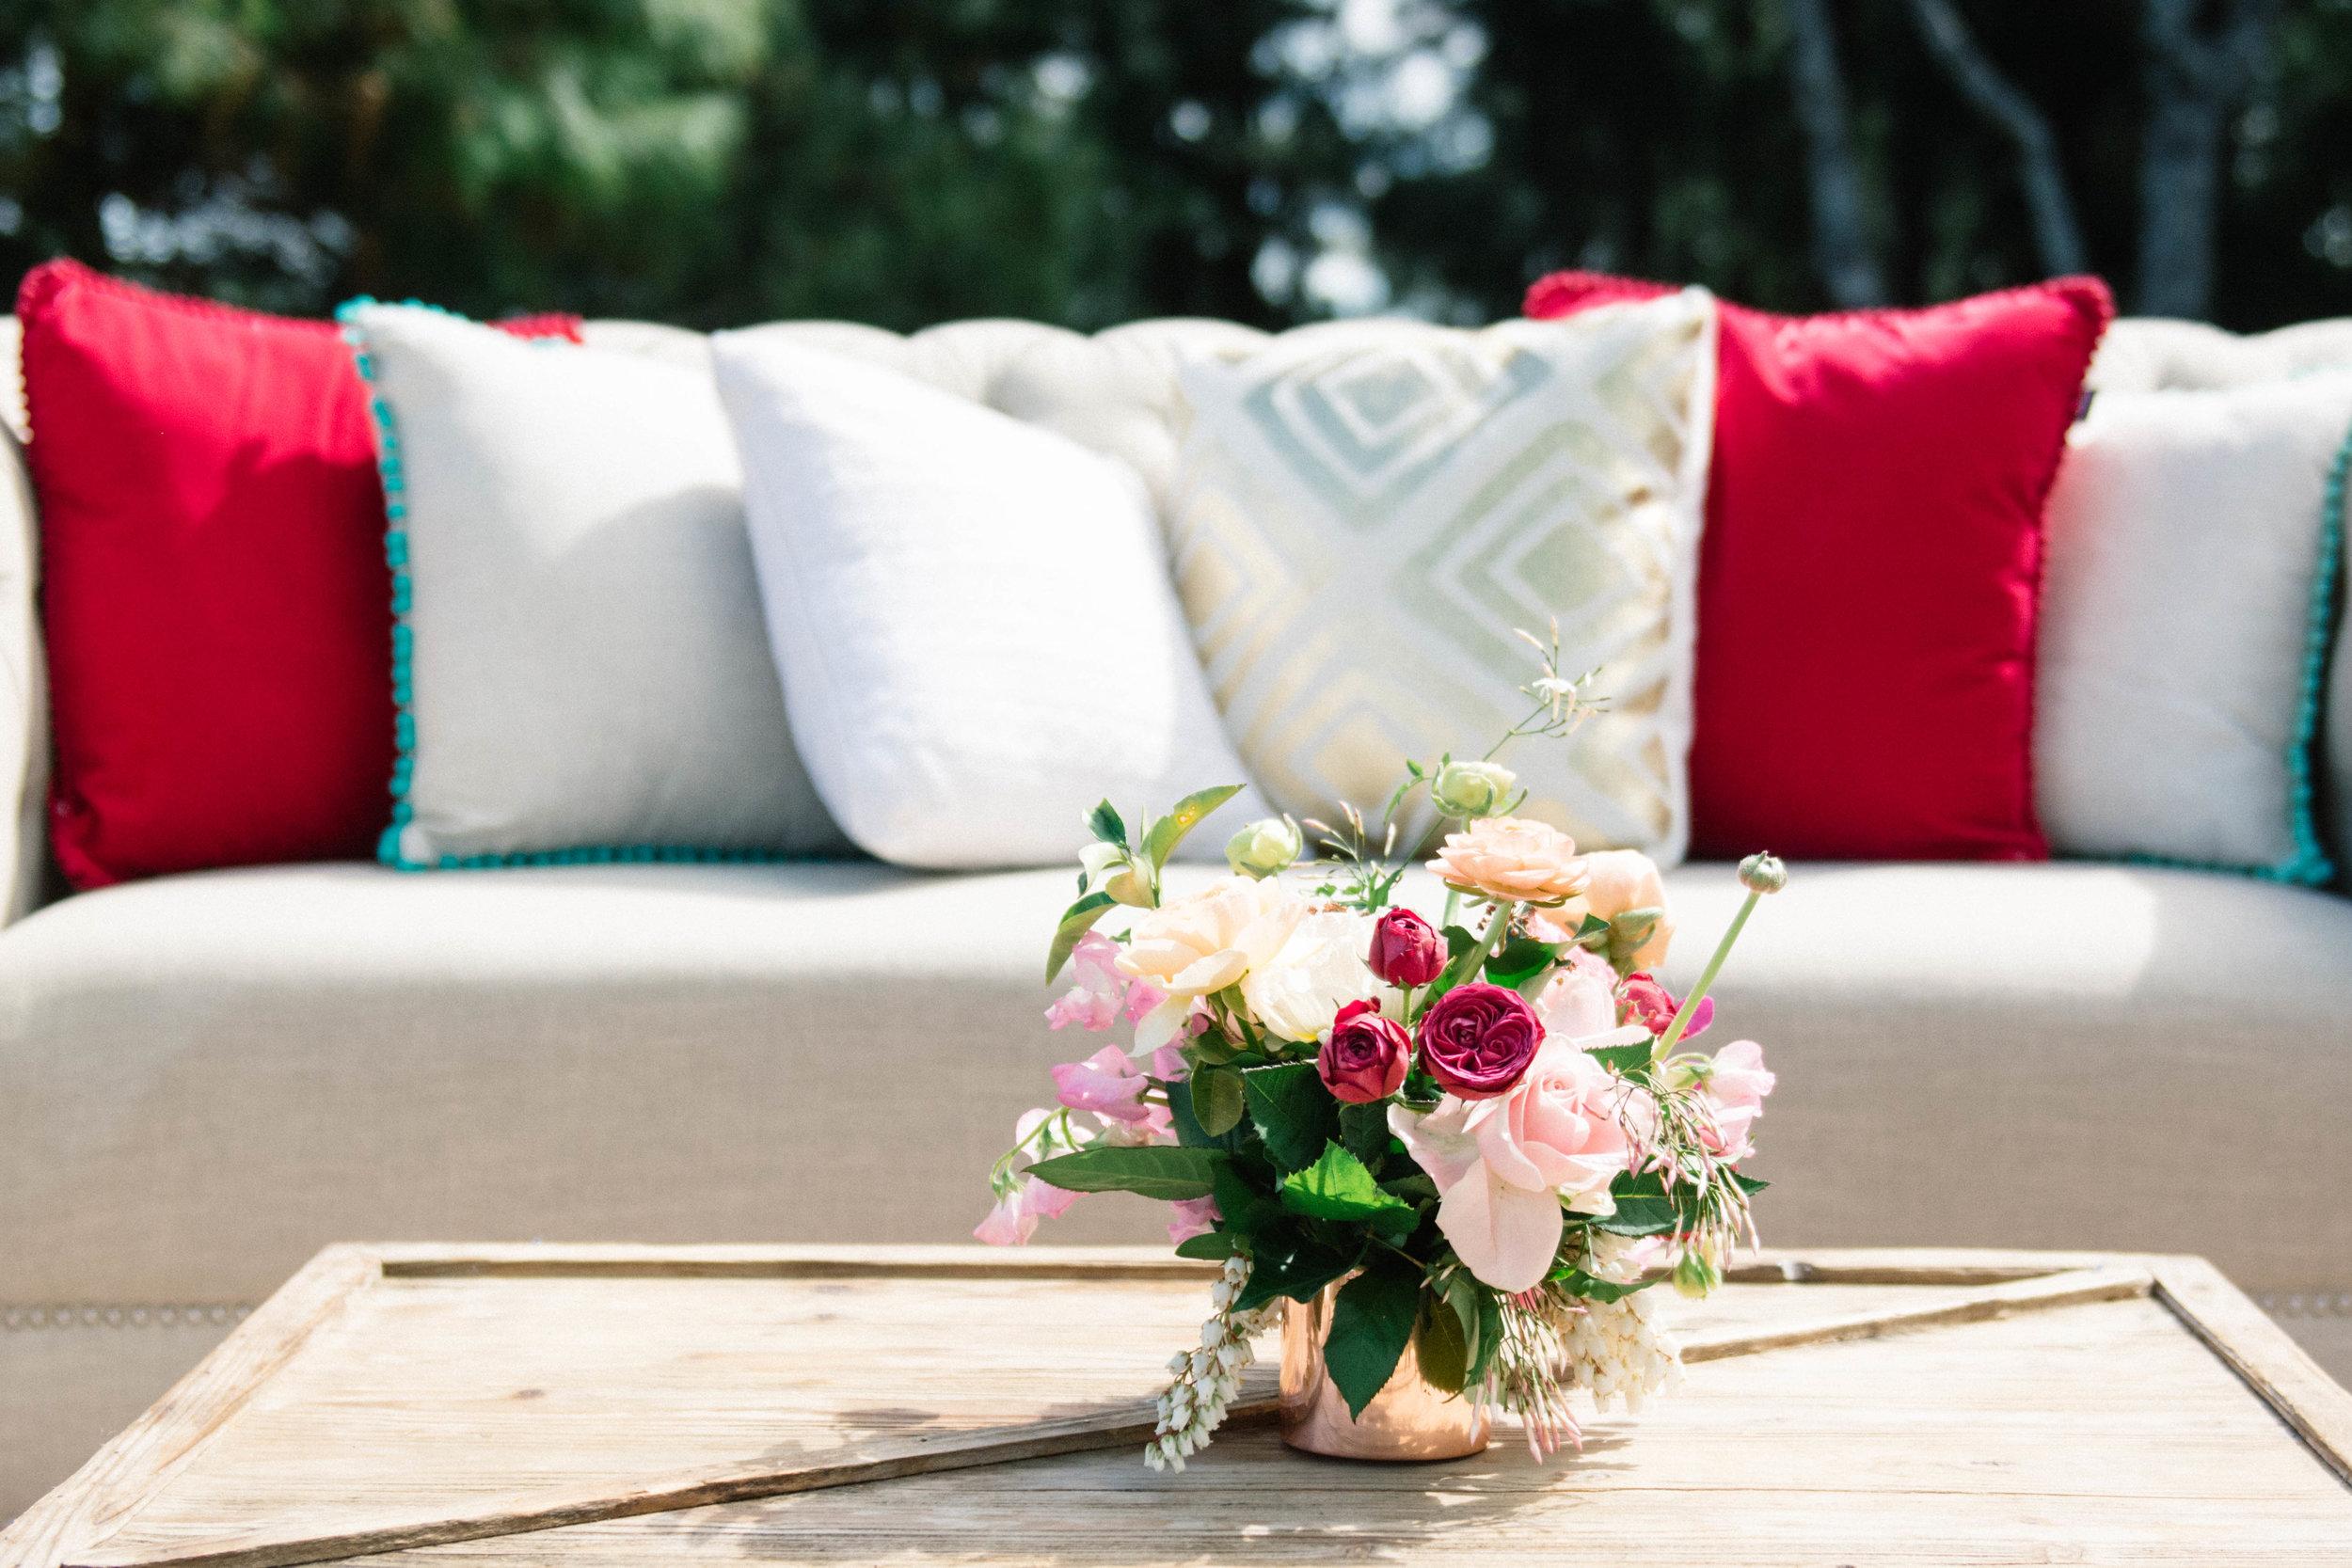 Hampton Event Hire - Wedding and Event Hire | Verandahs Byron Bay Wedding | www.hamptoneventhire.com